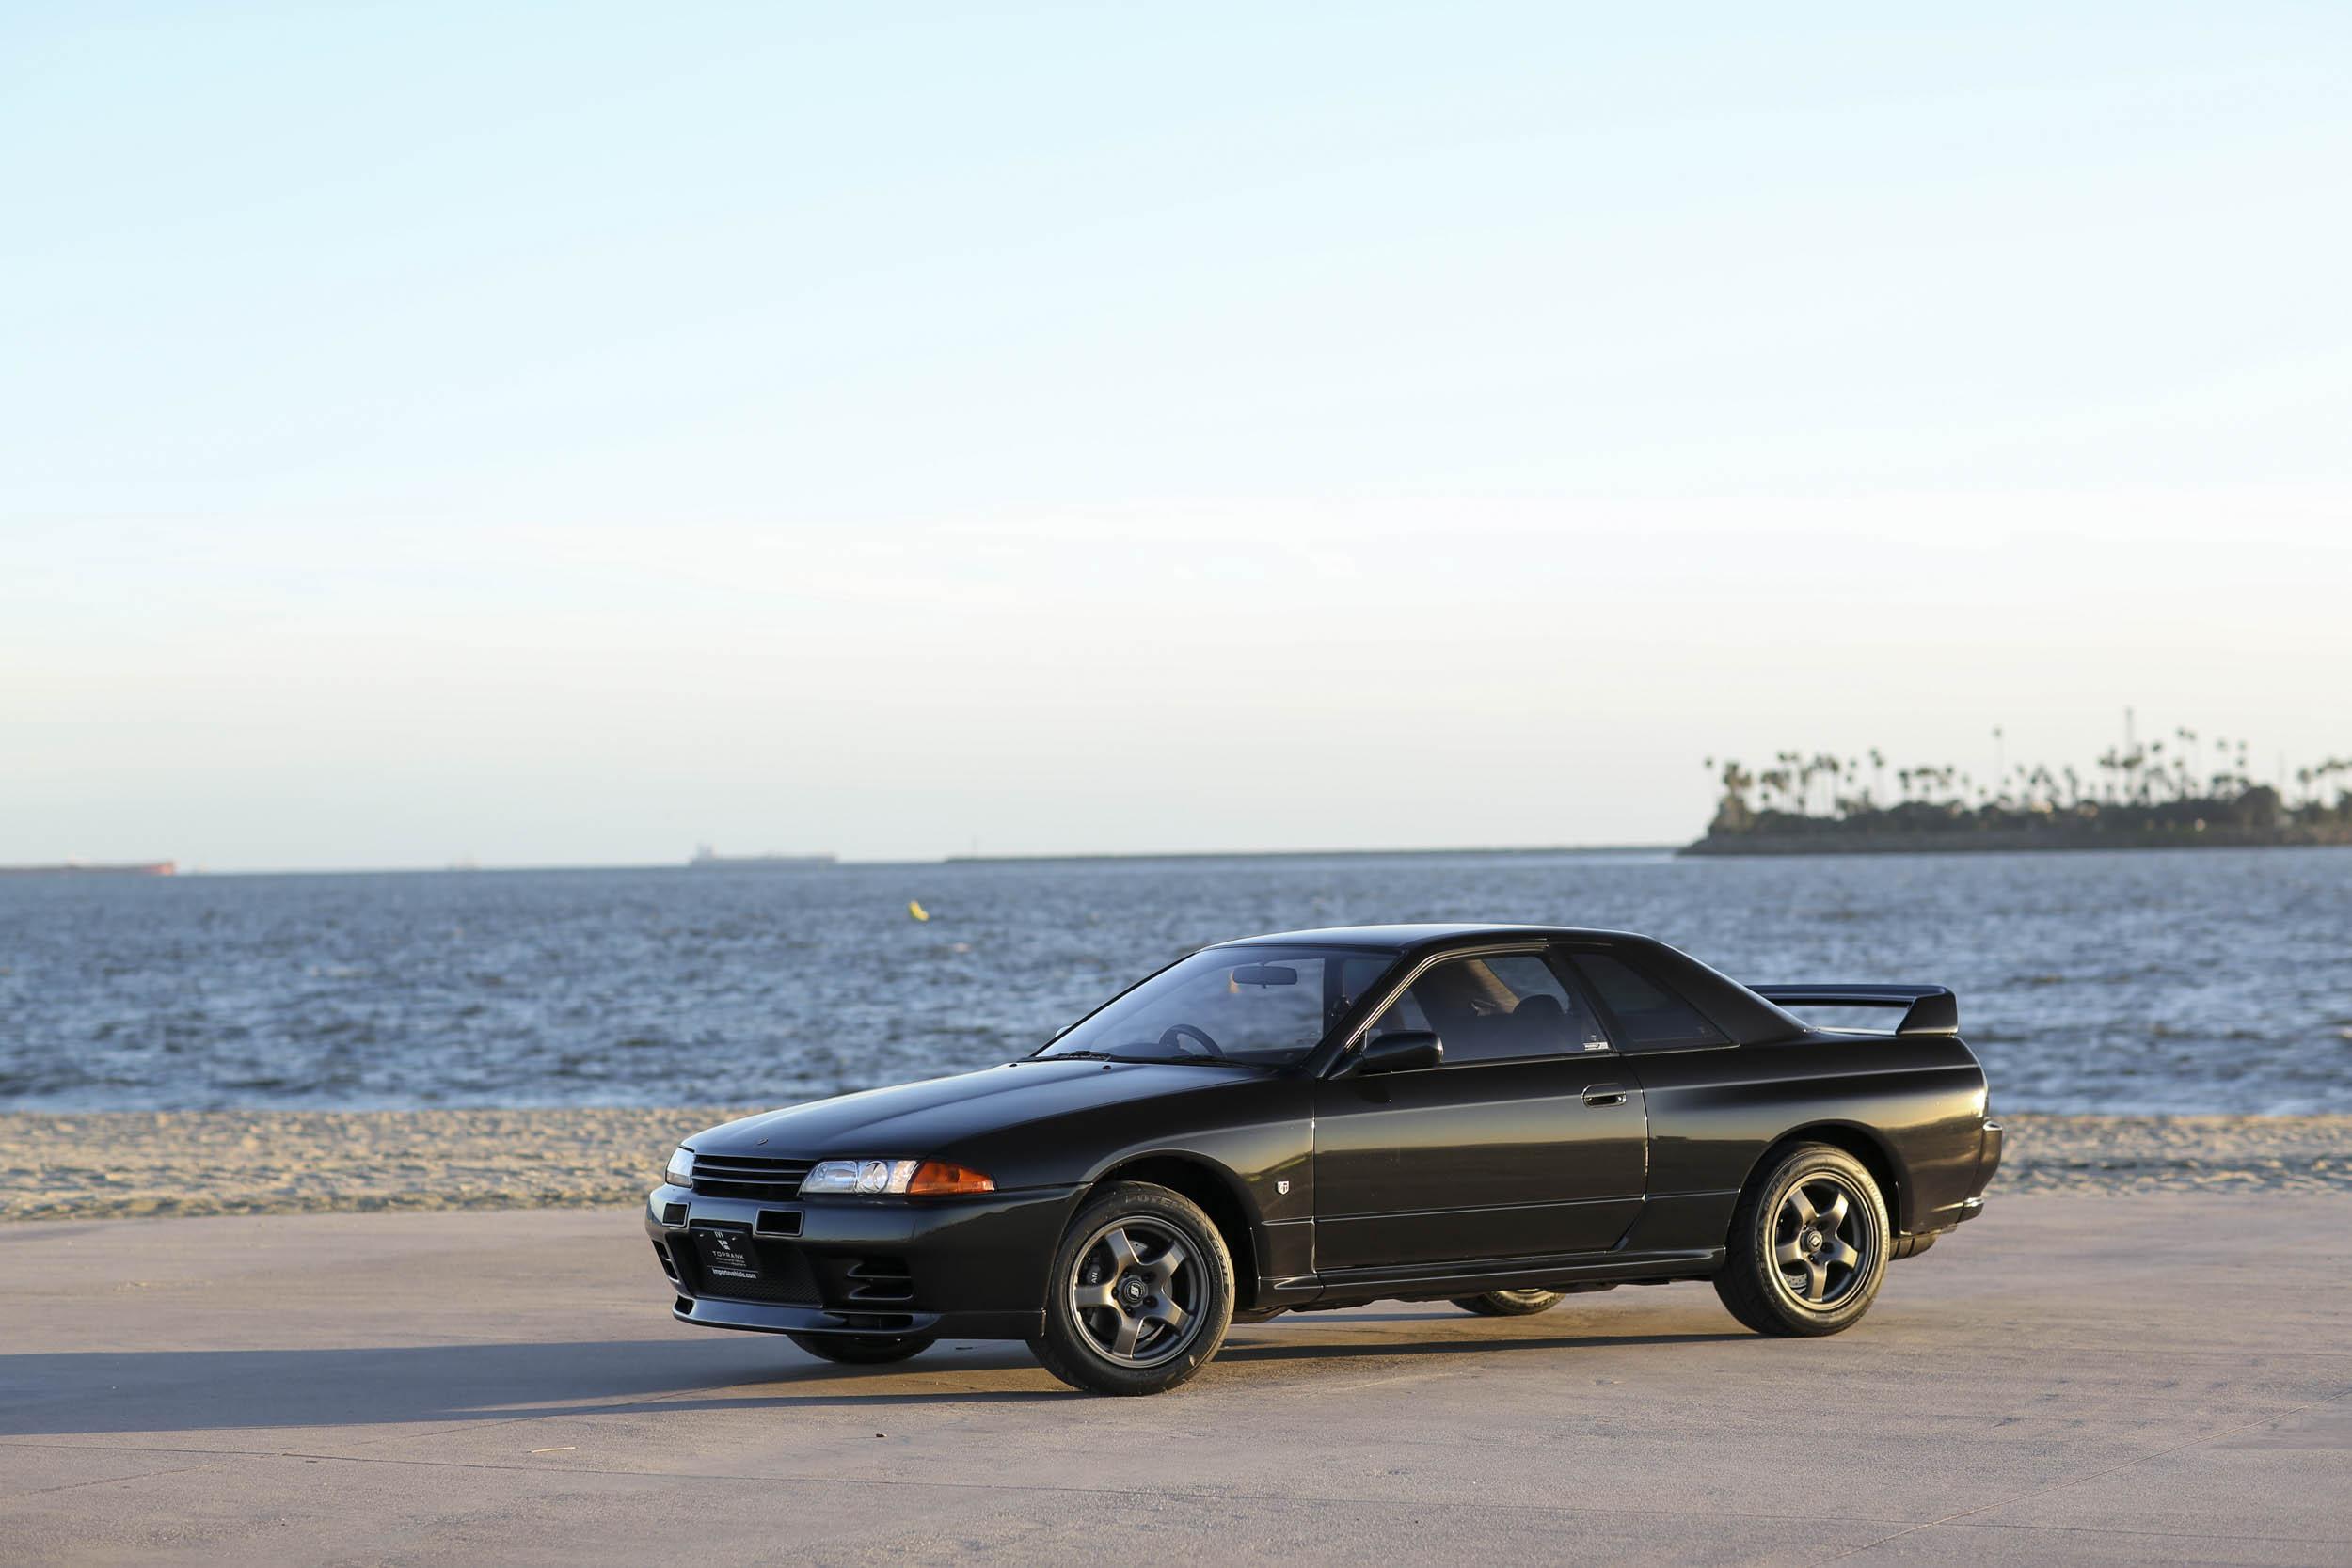 Nissan R32 GT-R profile